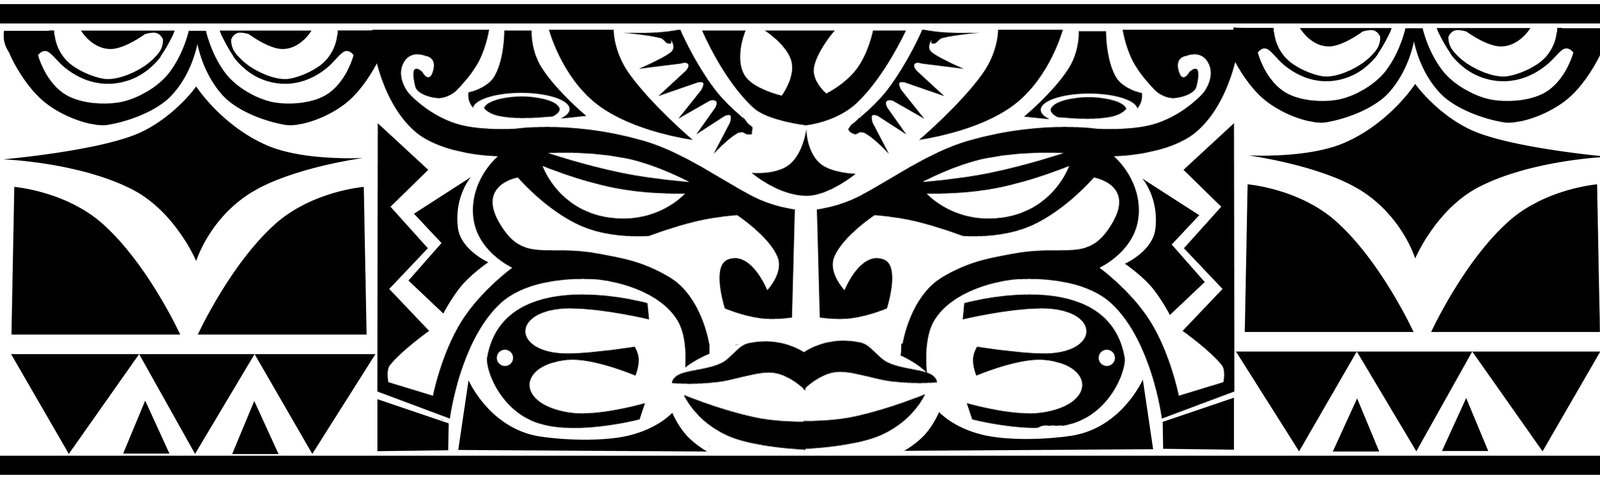 Famosos Forasteiro Tattoo: TATTOO TRIBAL OI26